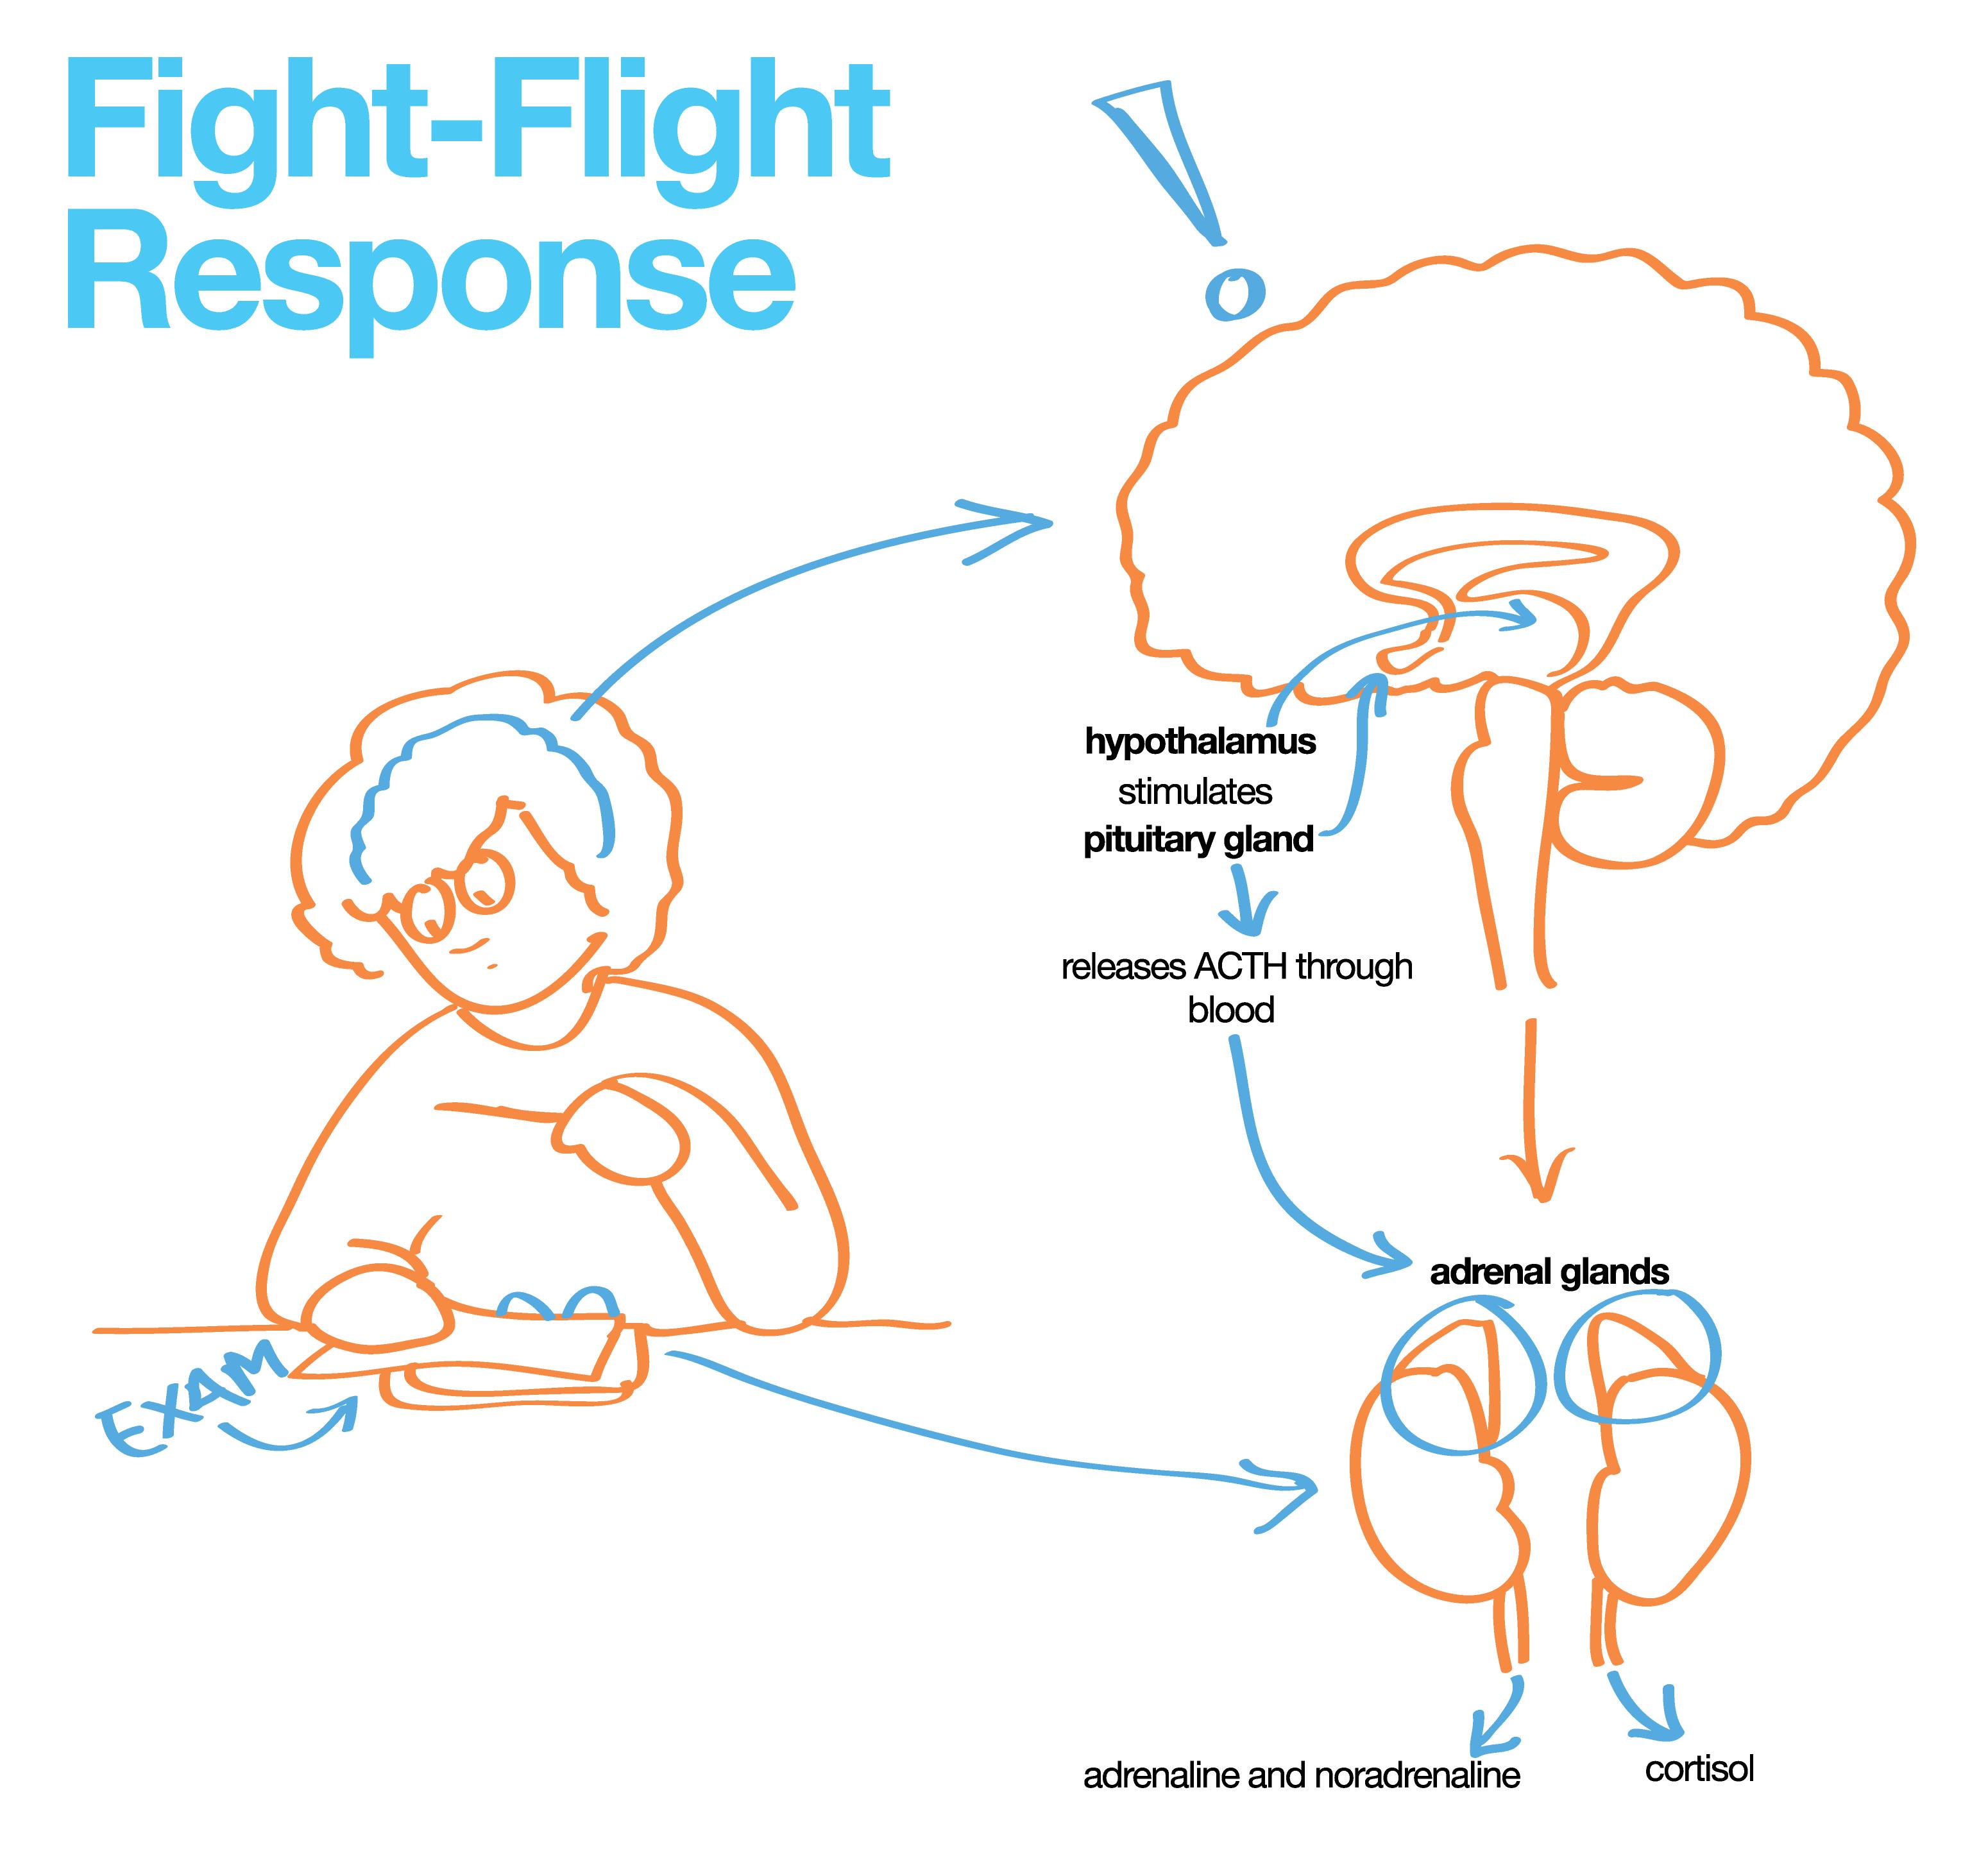 Our Responses To Stress | Stress, No response, Behavioral ...